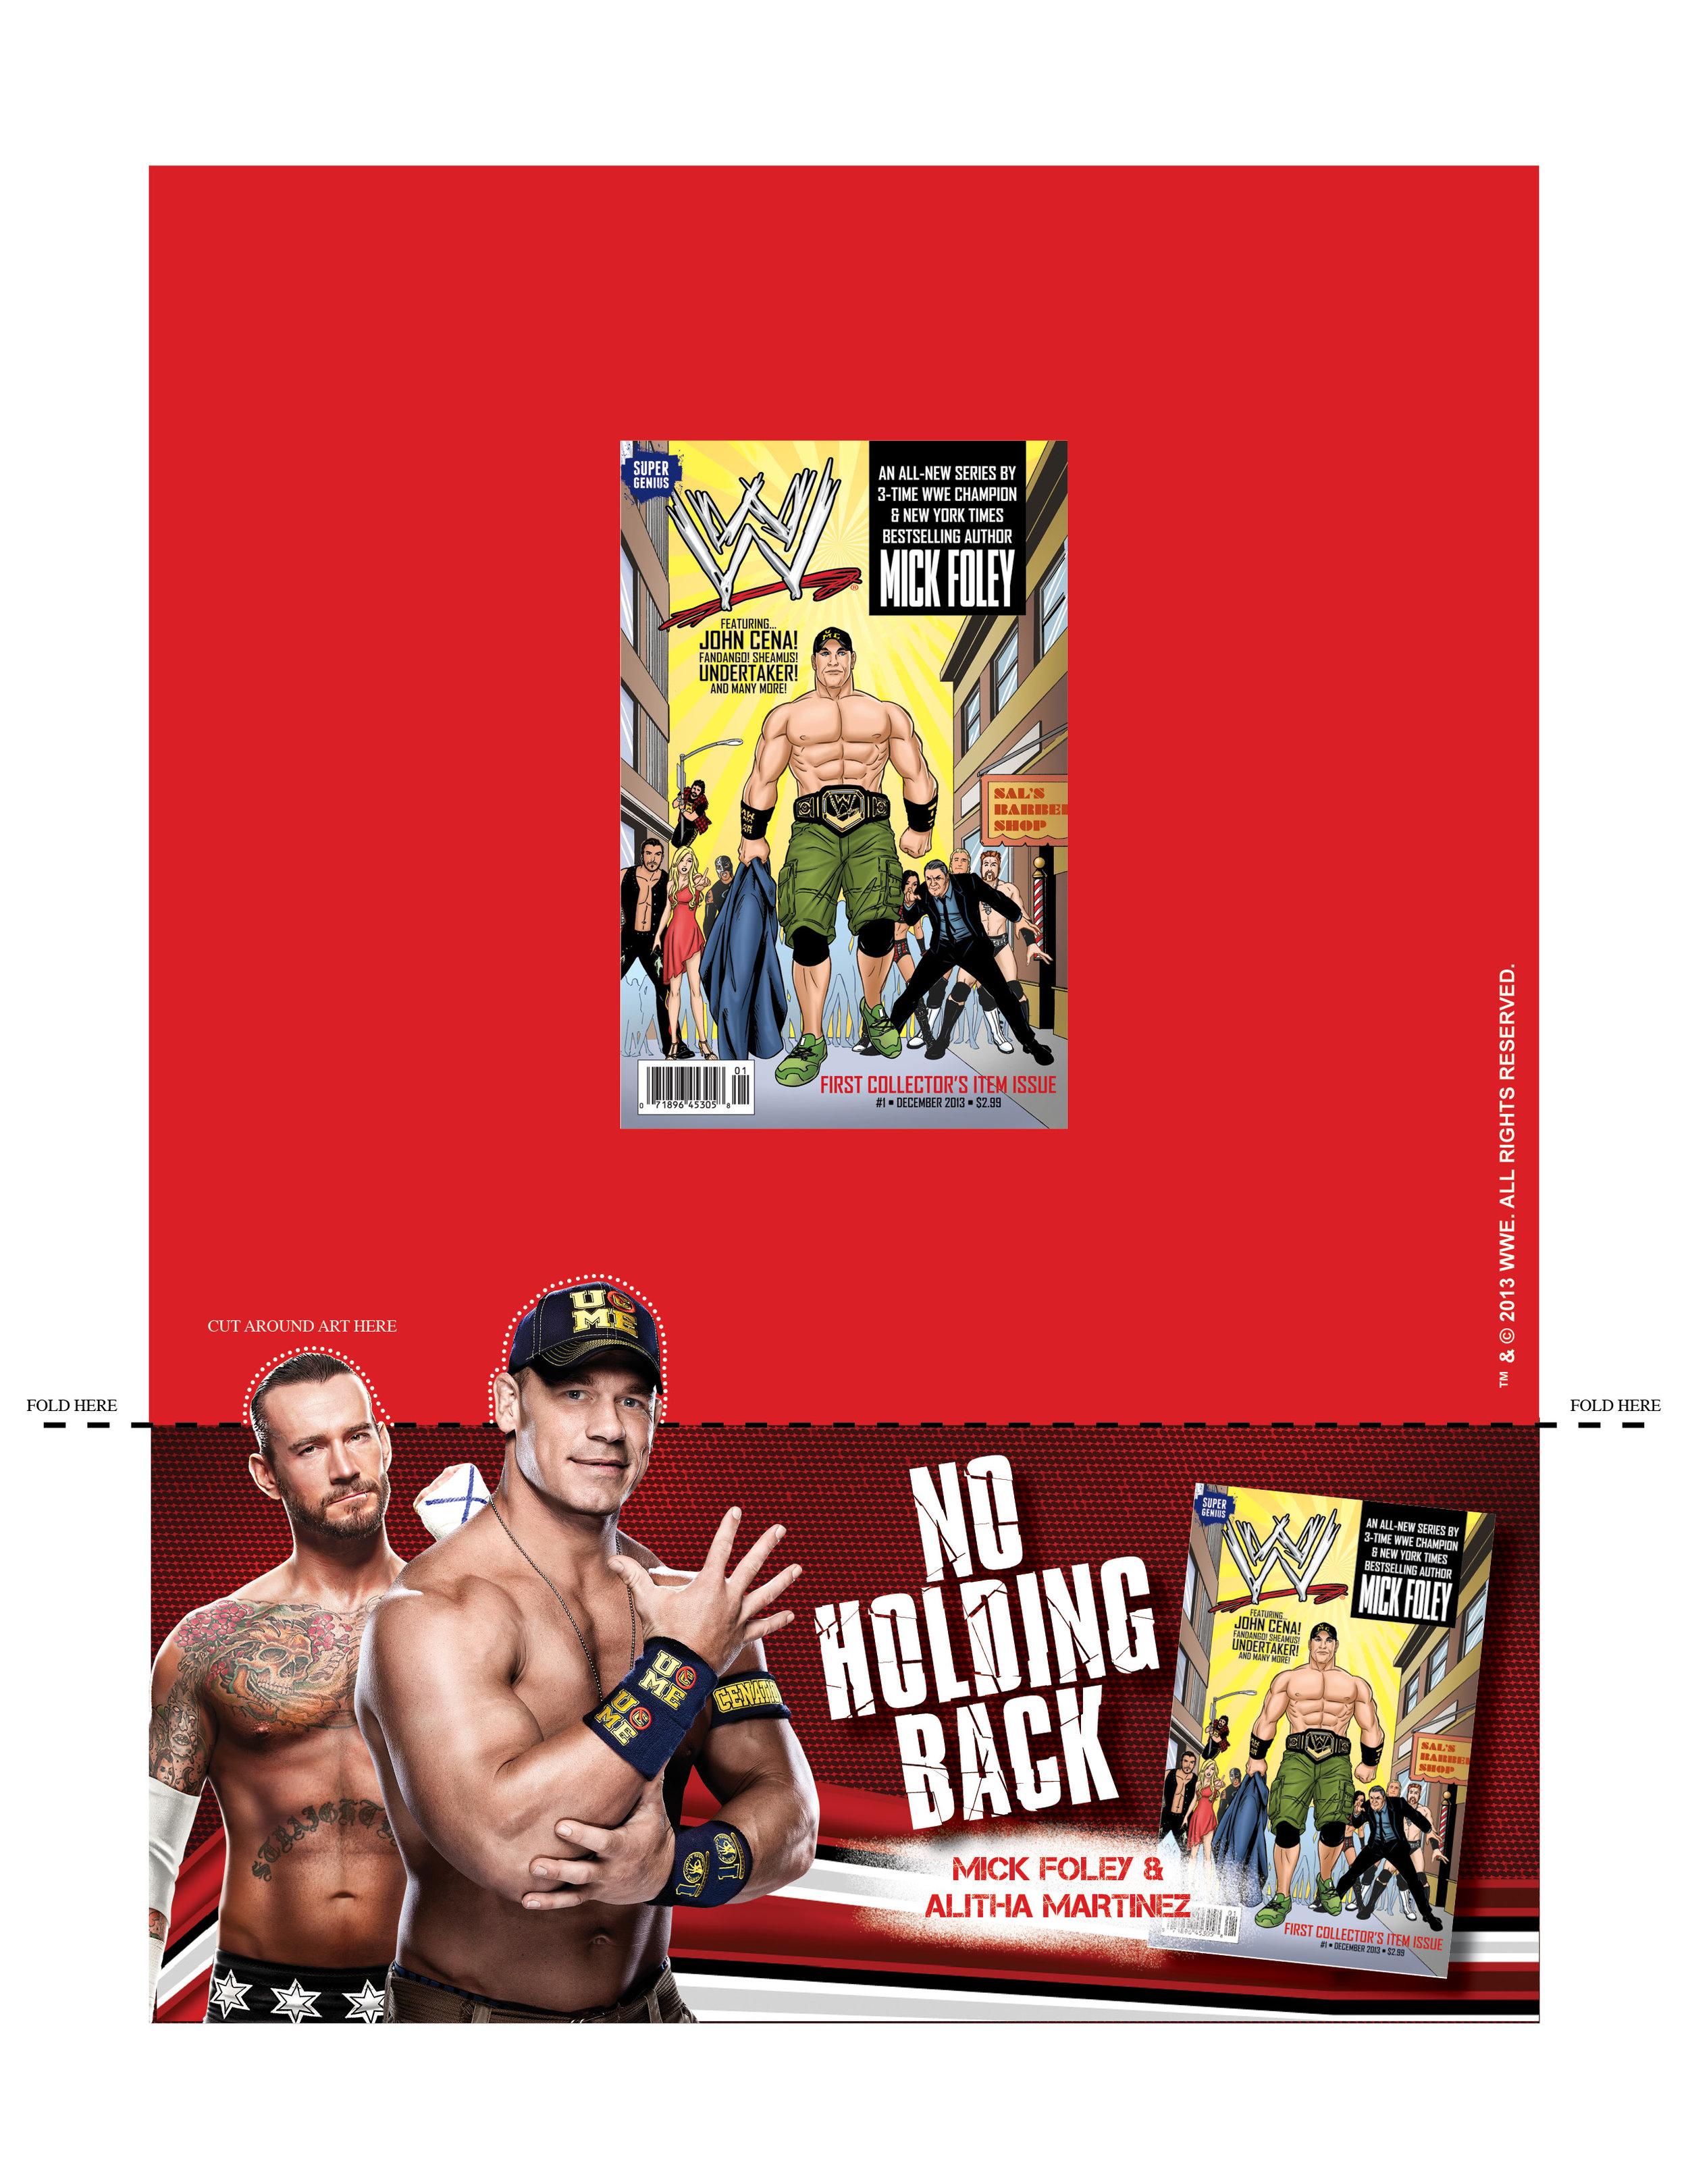 9-12-13 WWE shelftalker 2.jpg